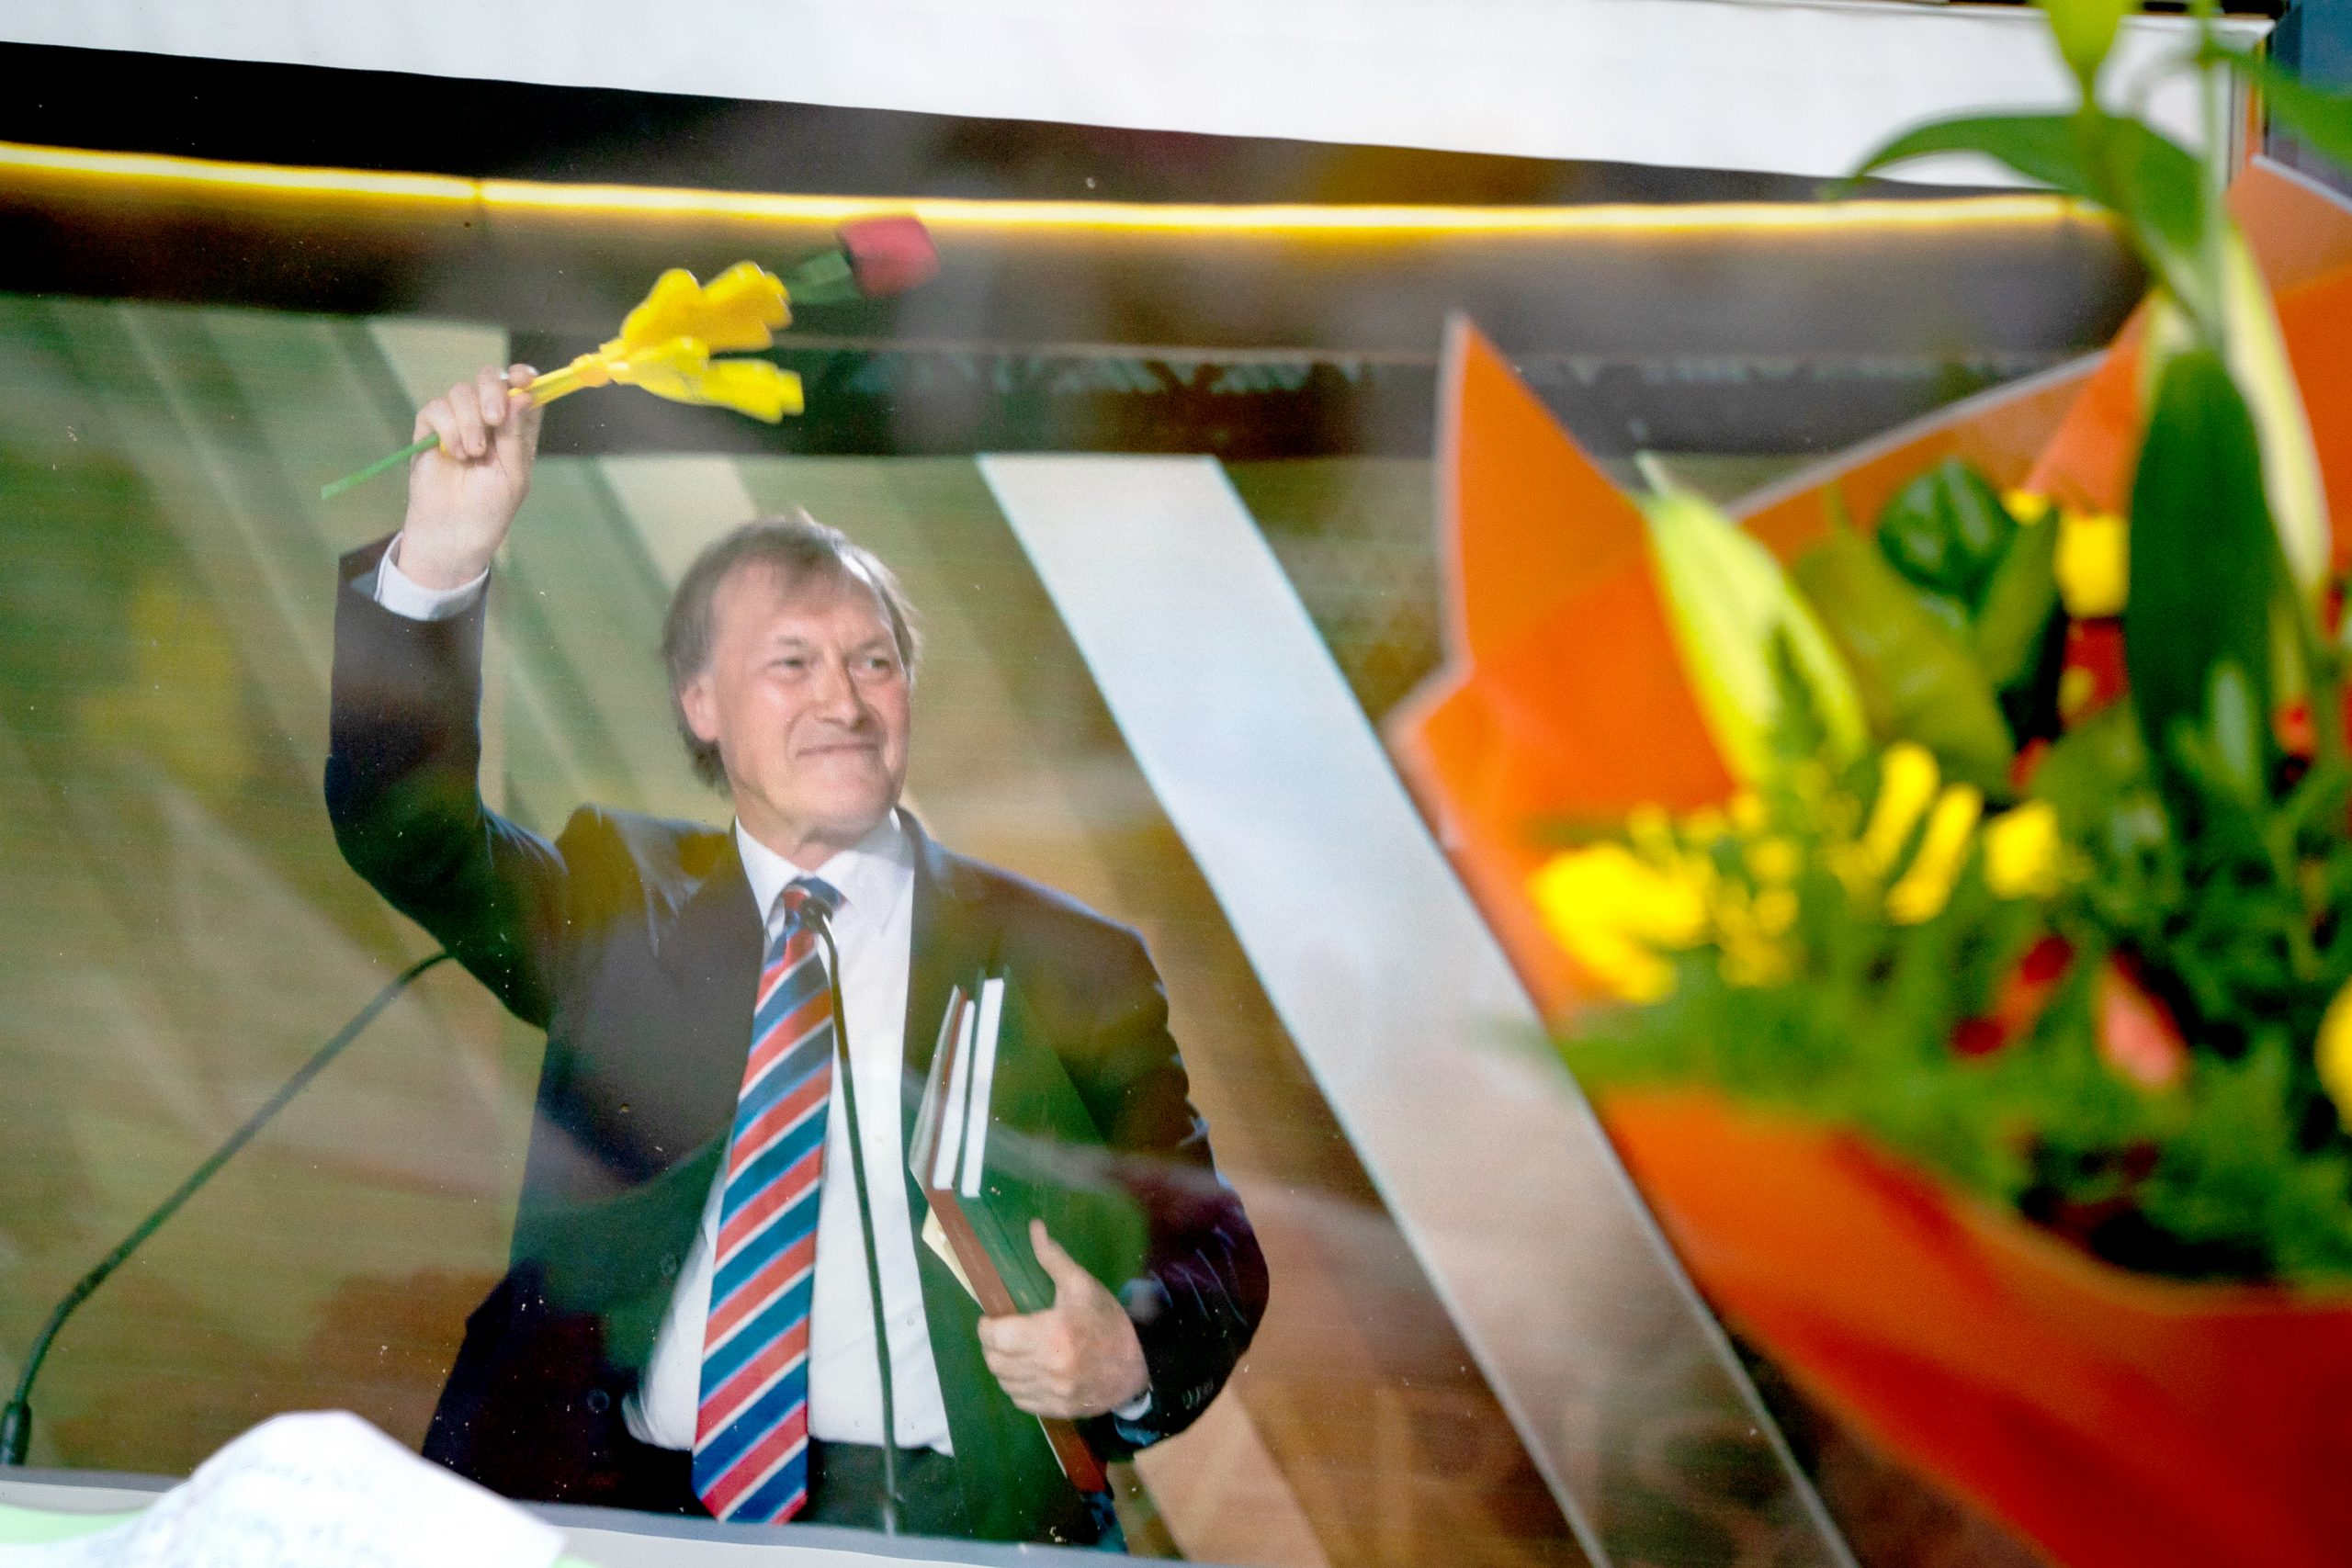 Catholic community pays tribute to 'inspiring' MP Sir David Amess